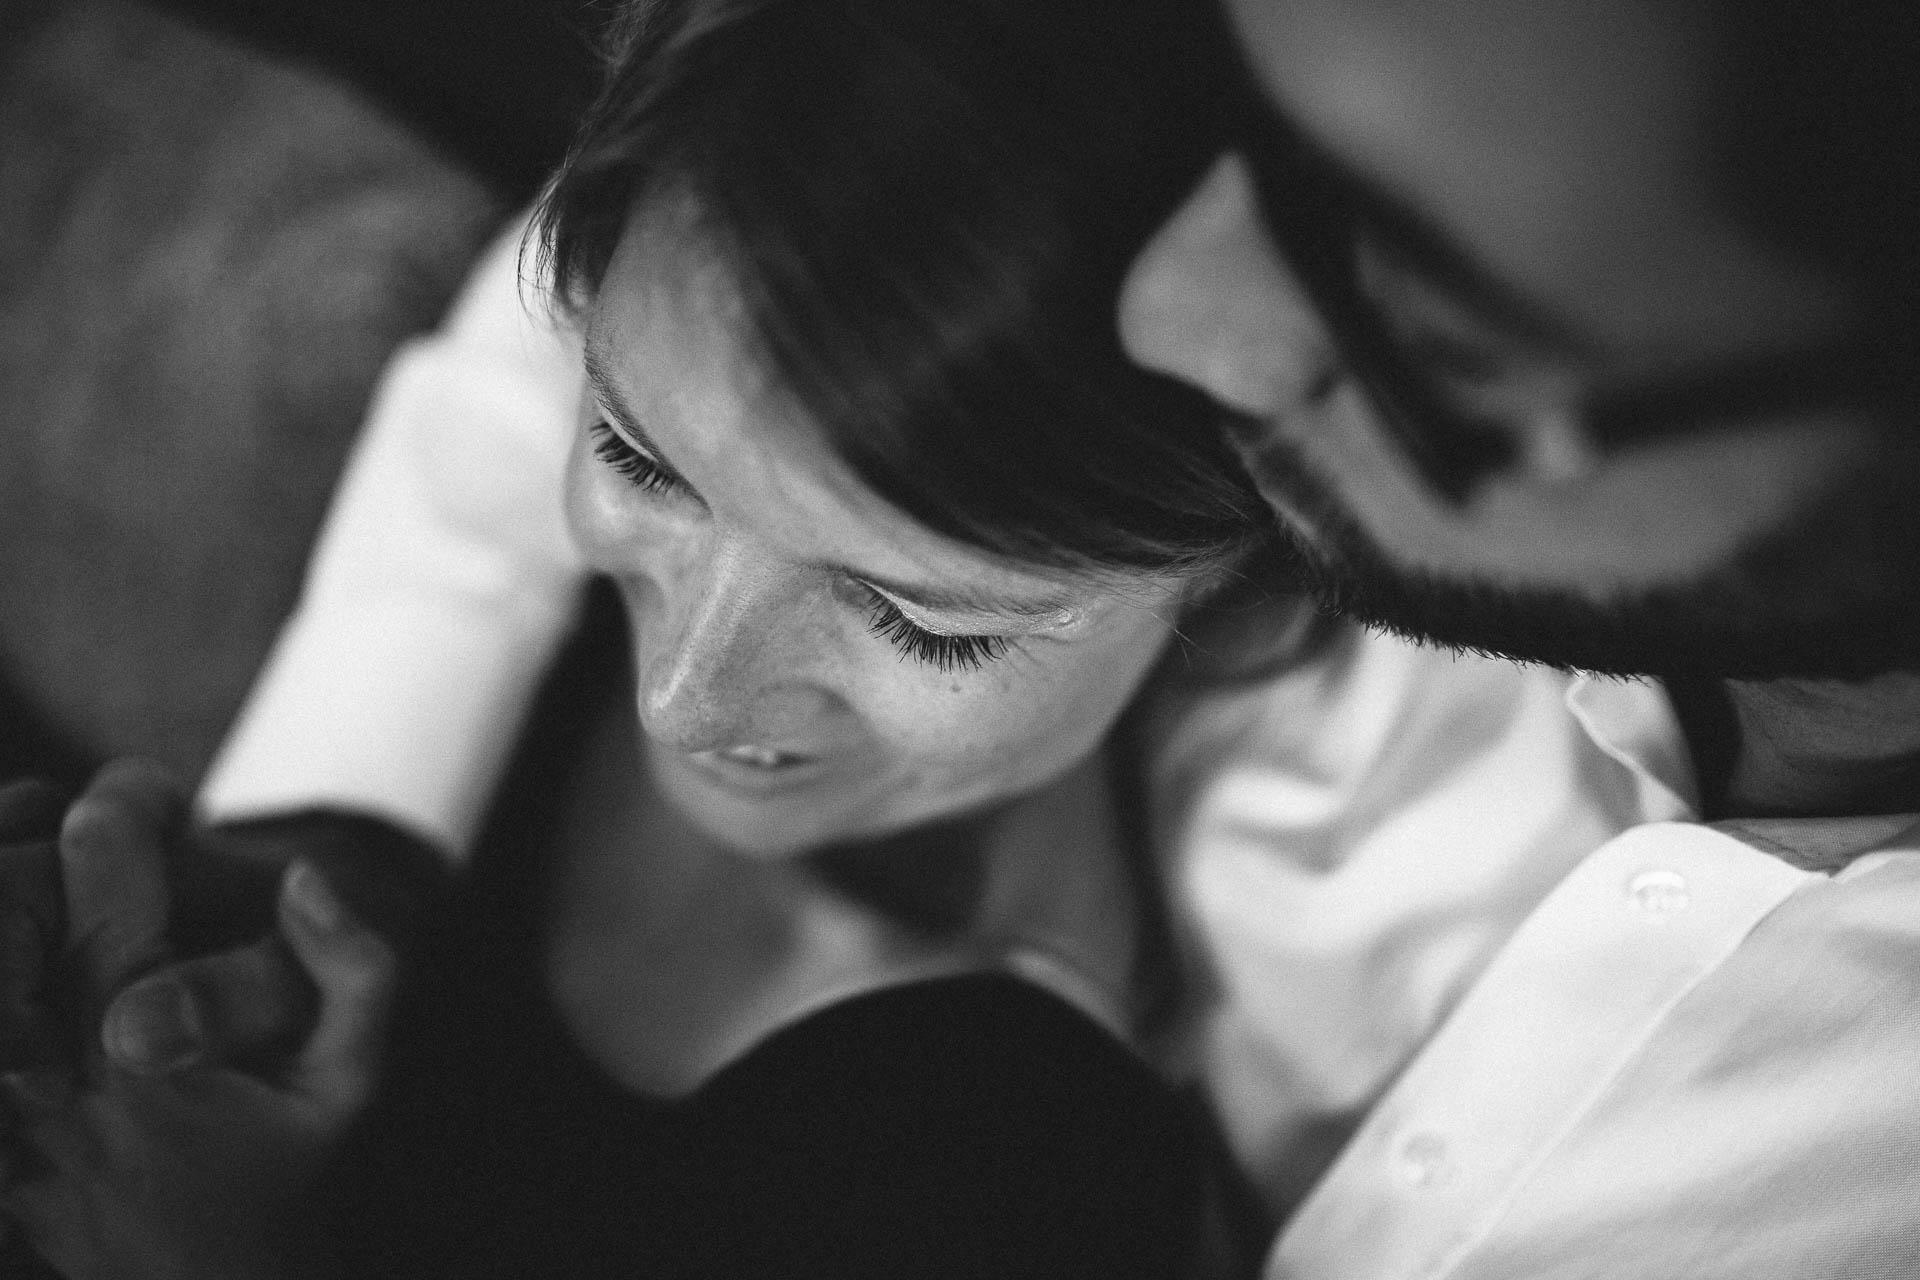 Marlene_Yoann_Engagement_Paris_France_JeanLaurentGaudy_007